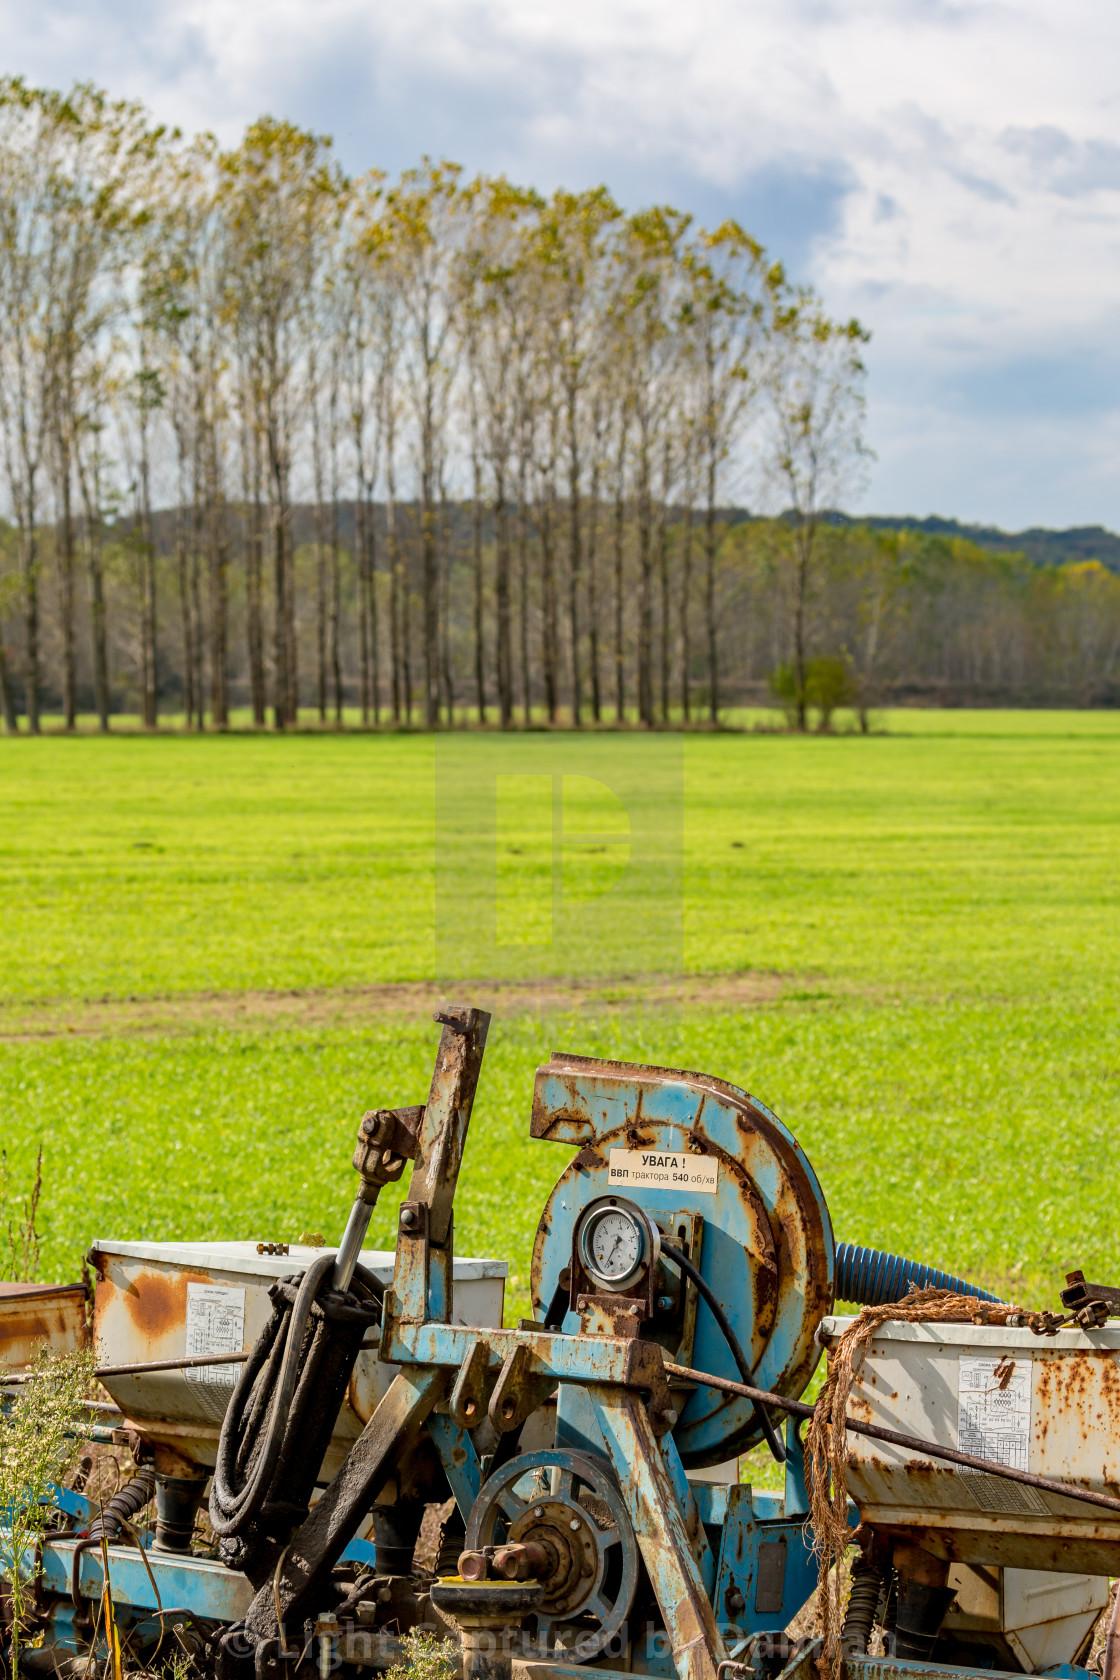 """Old farm machine outdoors"" stock image"